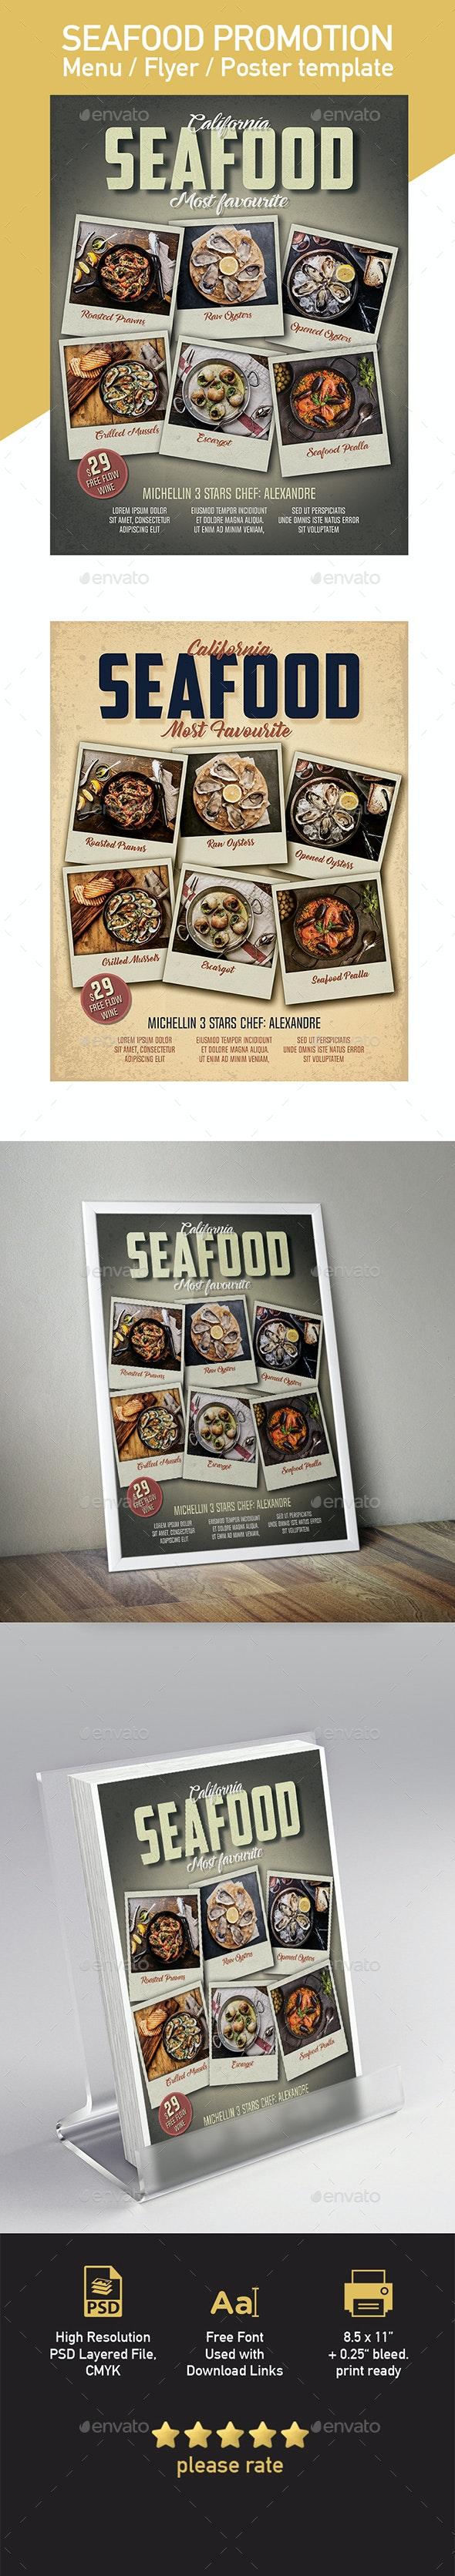 Vintage & Retro Restaurant Menu Template - US Letter Flyer Template - Restaurant Flyers